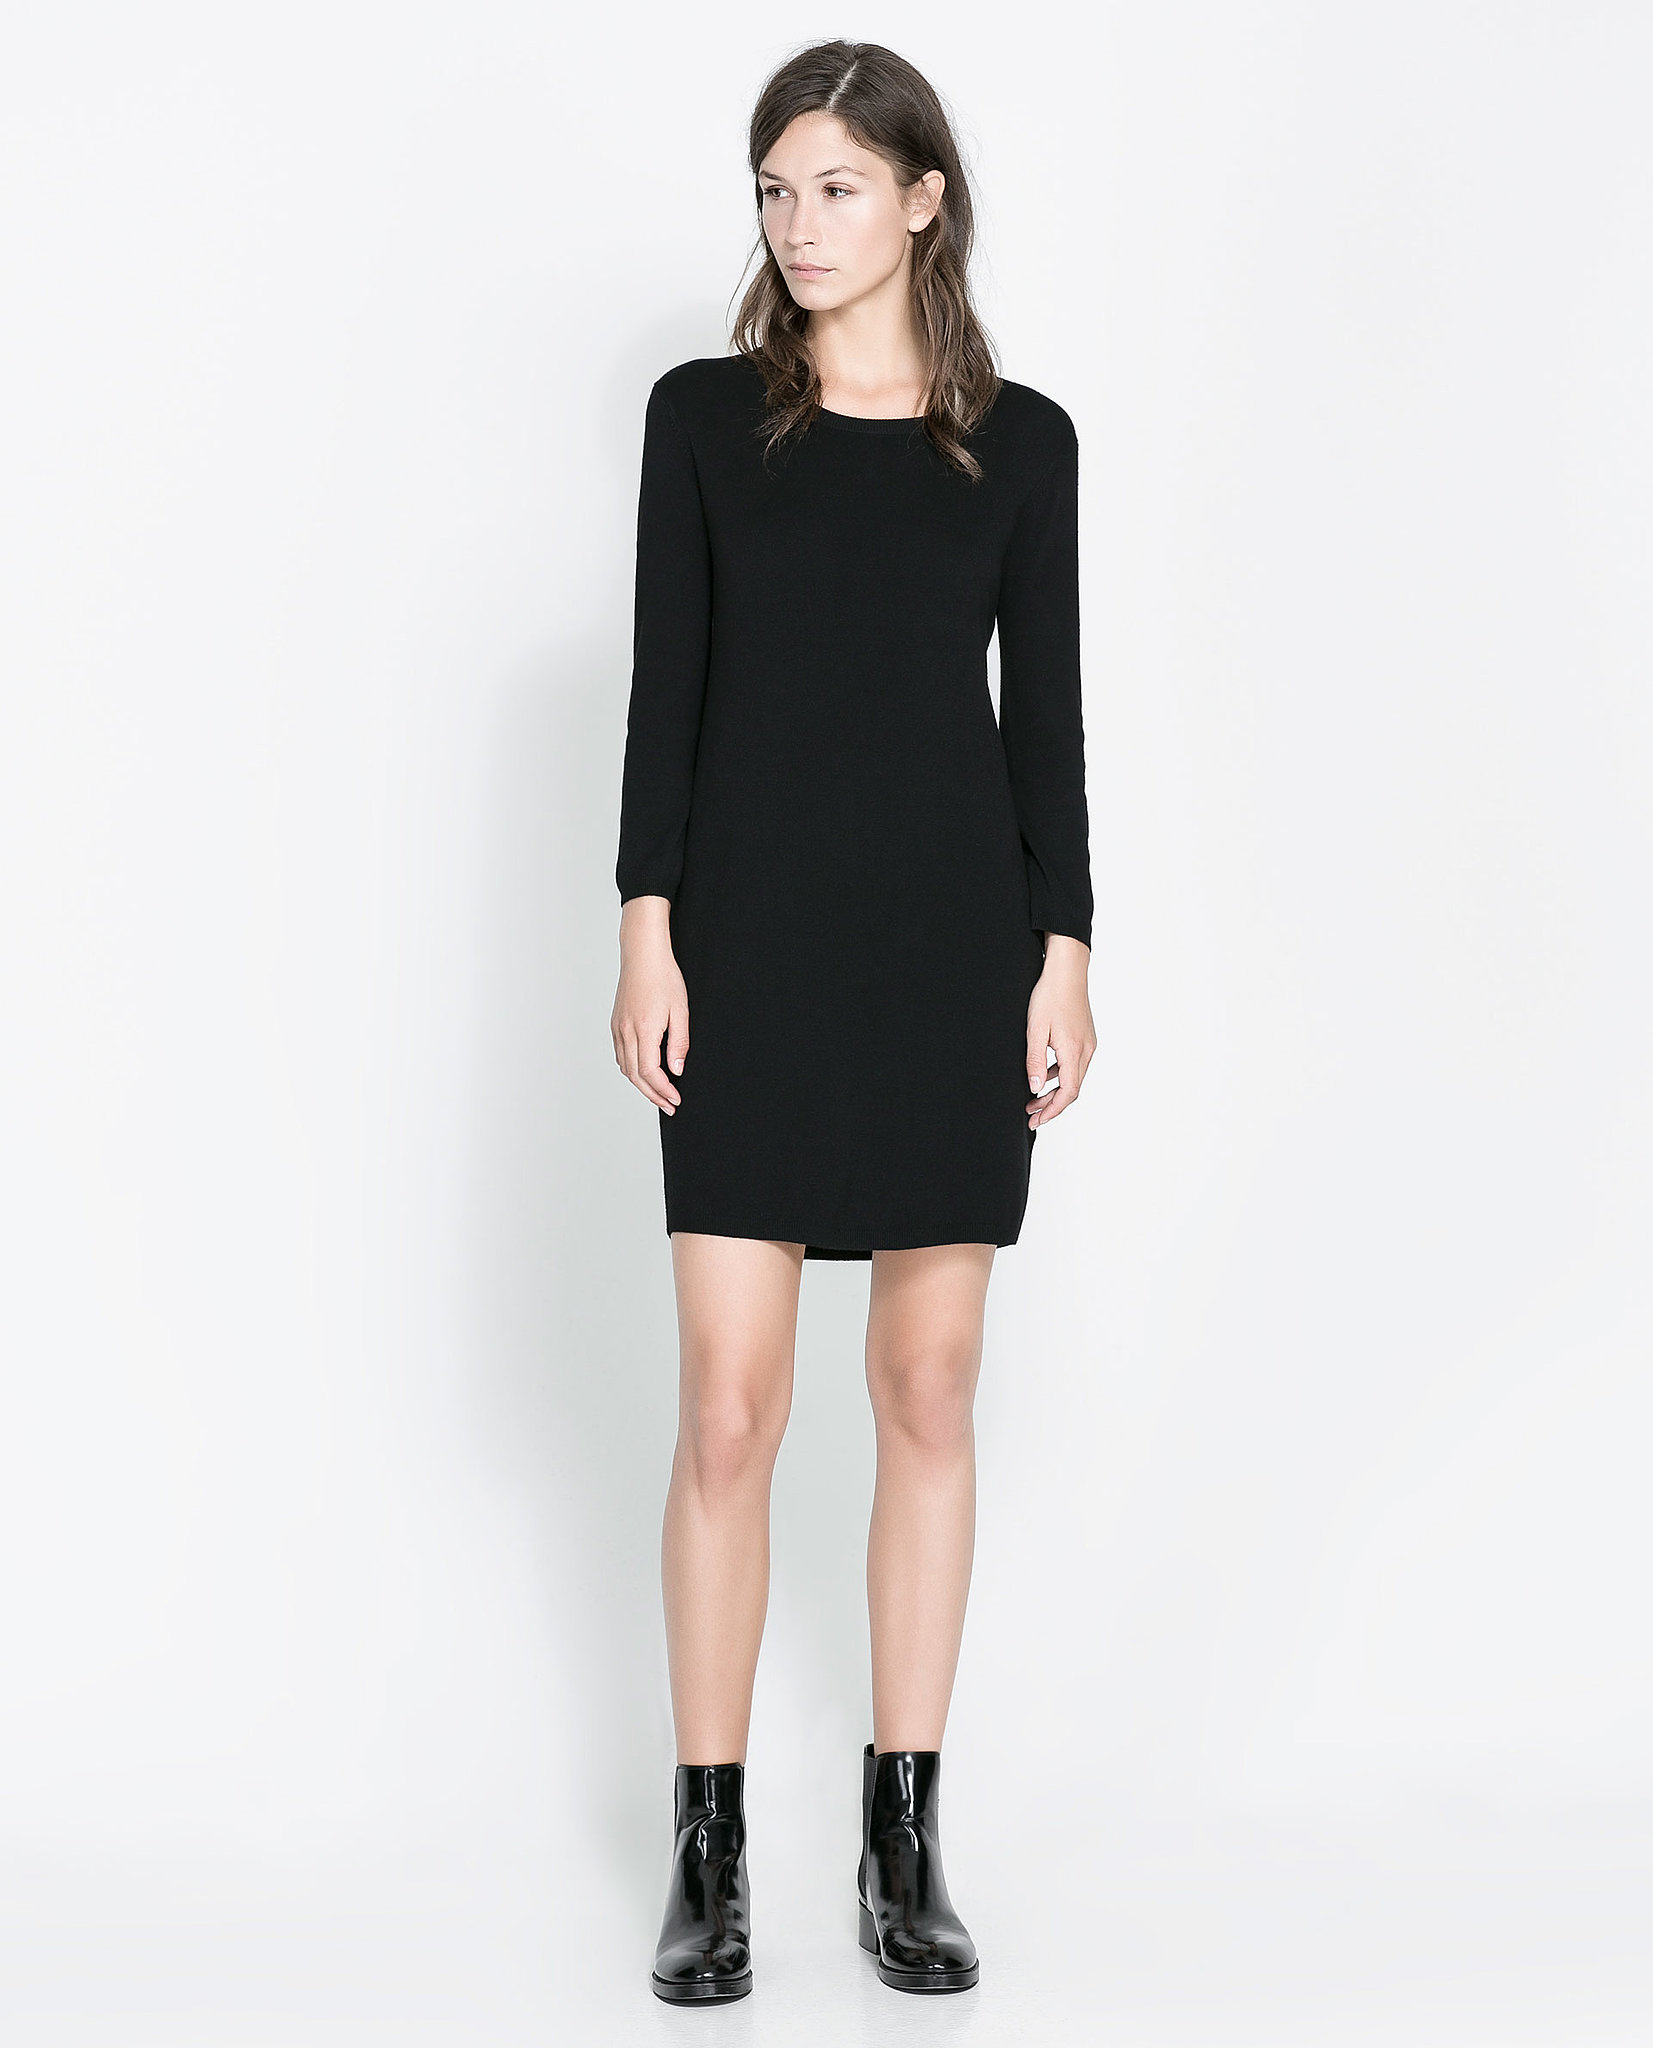 We consider Zara's zip-back dress ($50) a wardrobe essential.